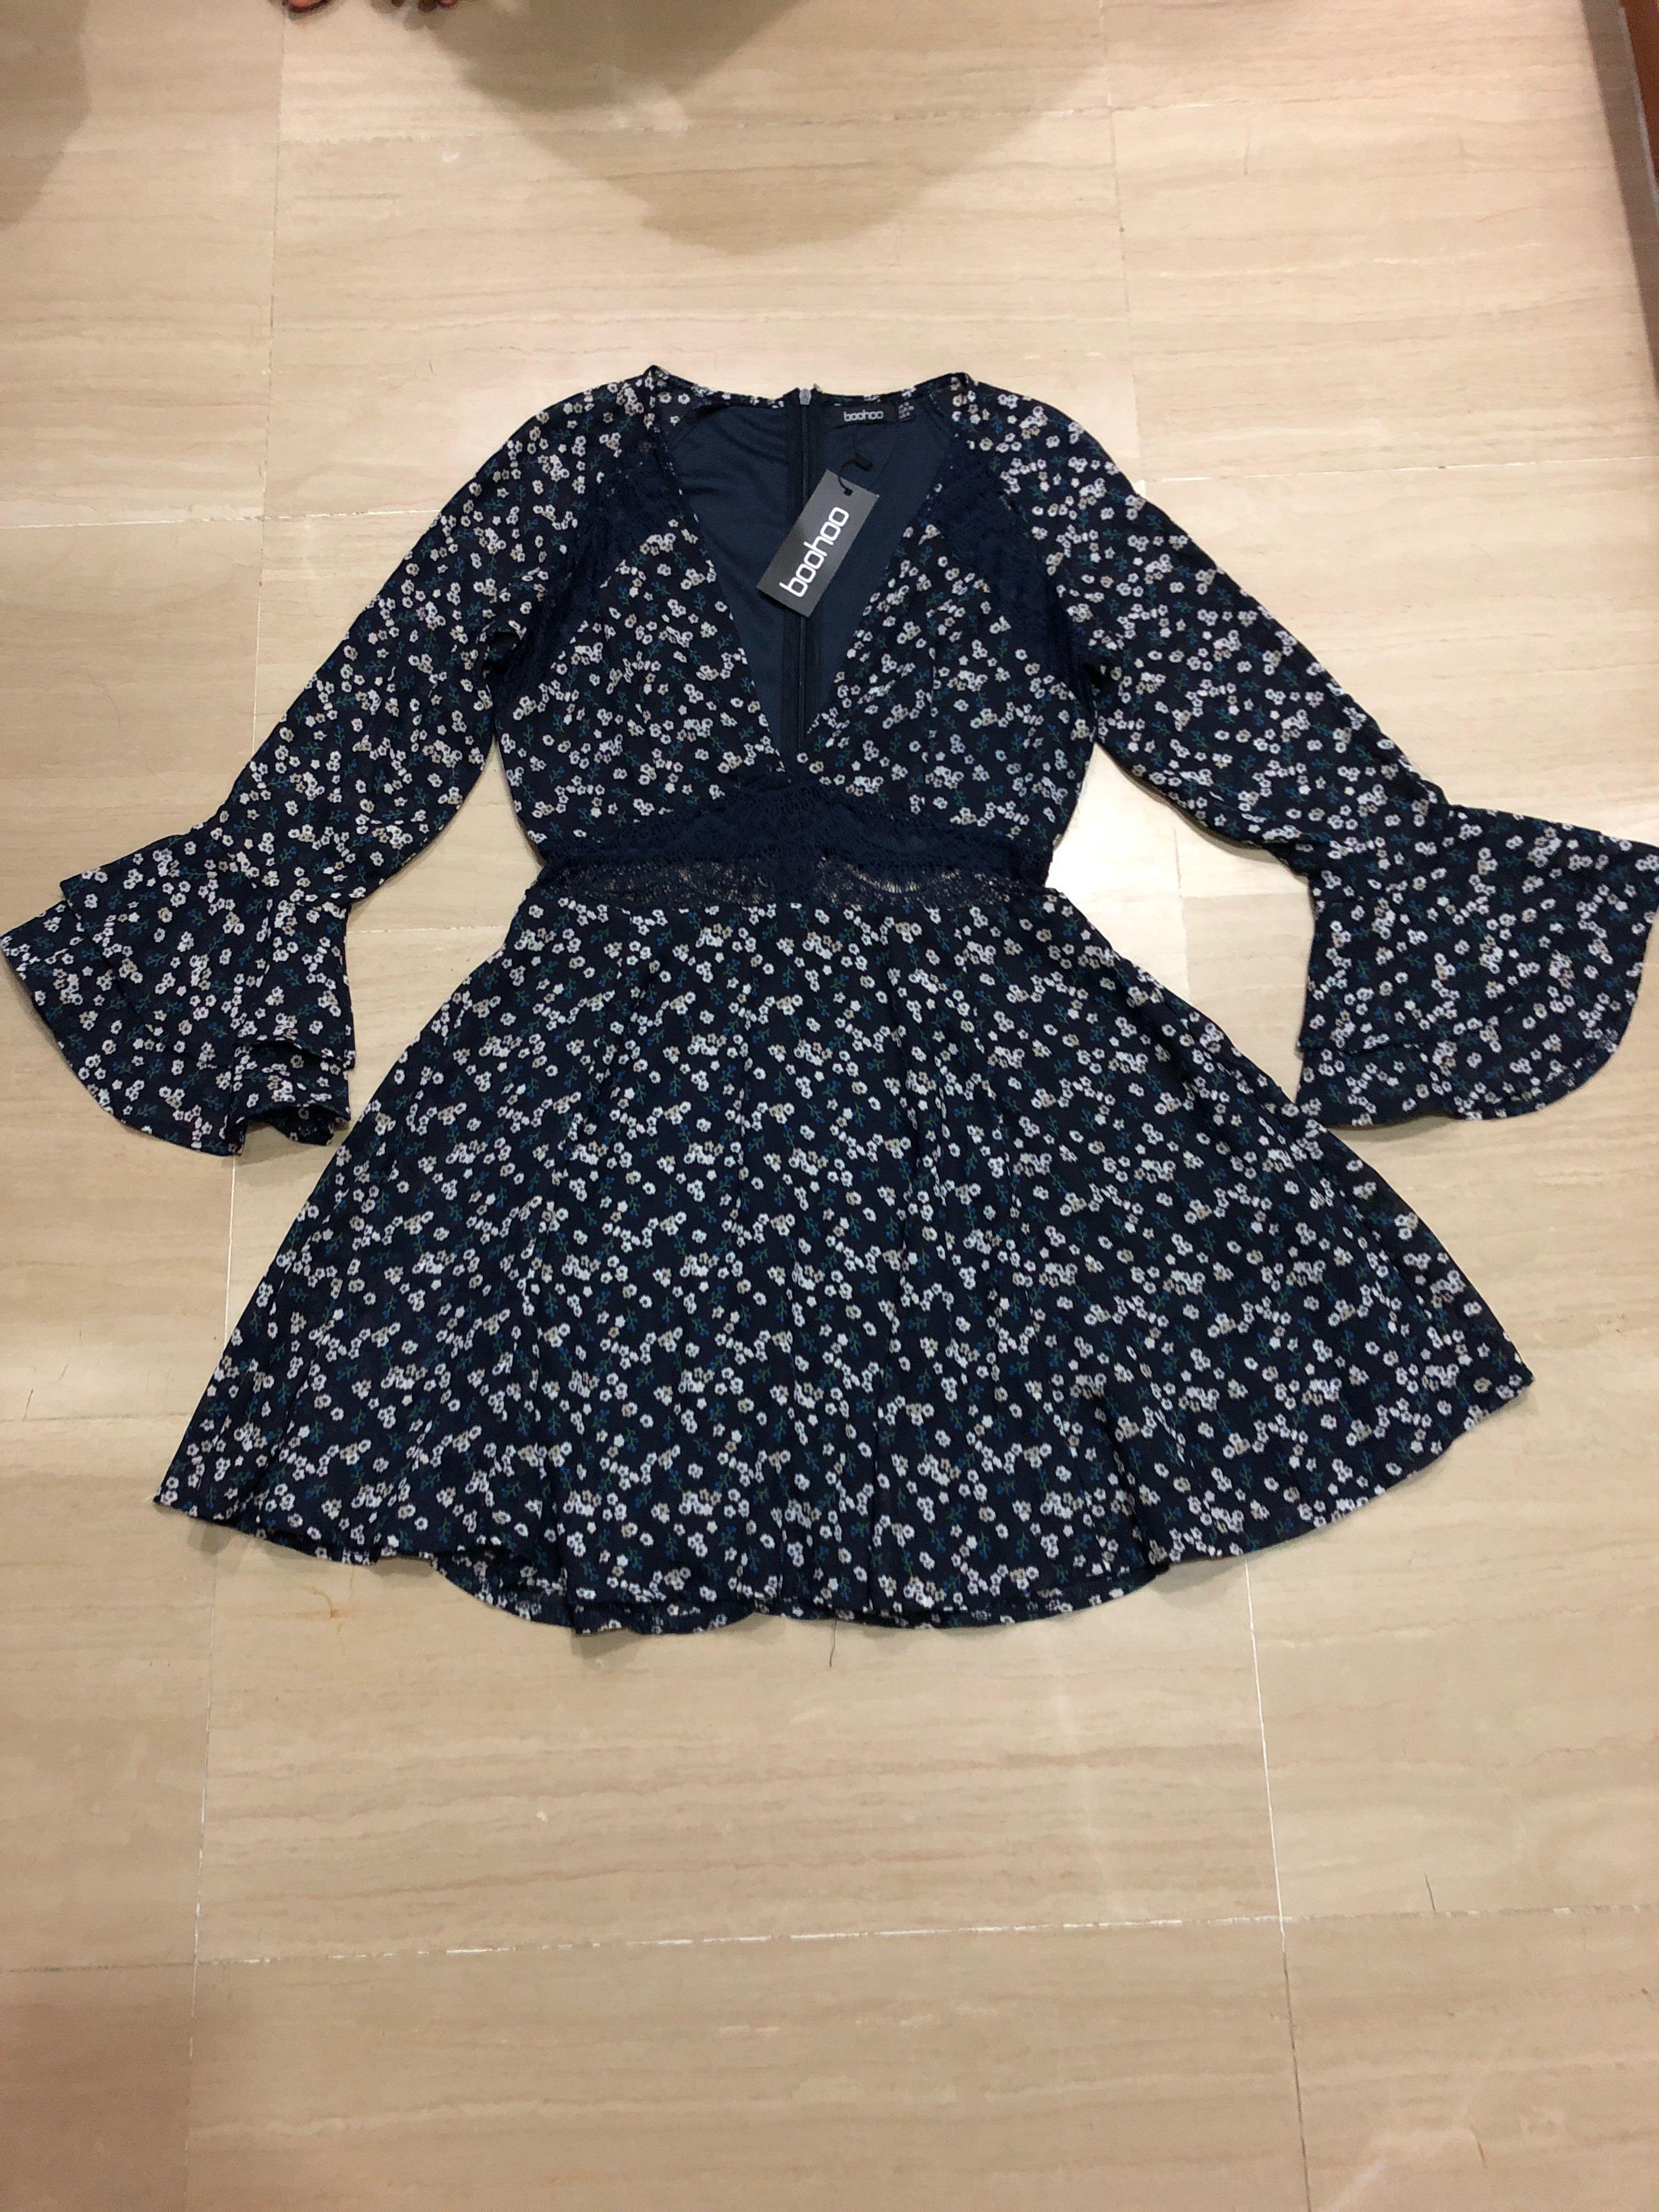 3cca170af2bd Boohoo Floral Lace Insert Skater Dress, Women's Fashion, Clothes ...